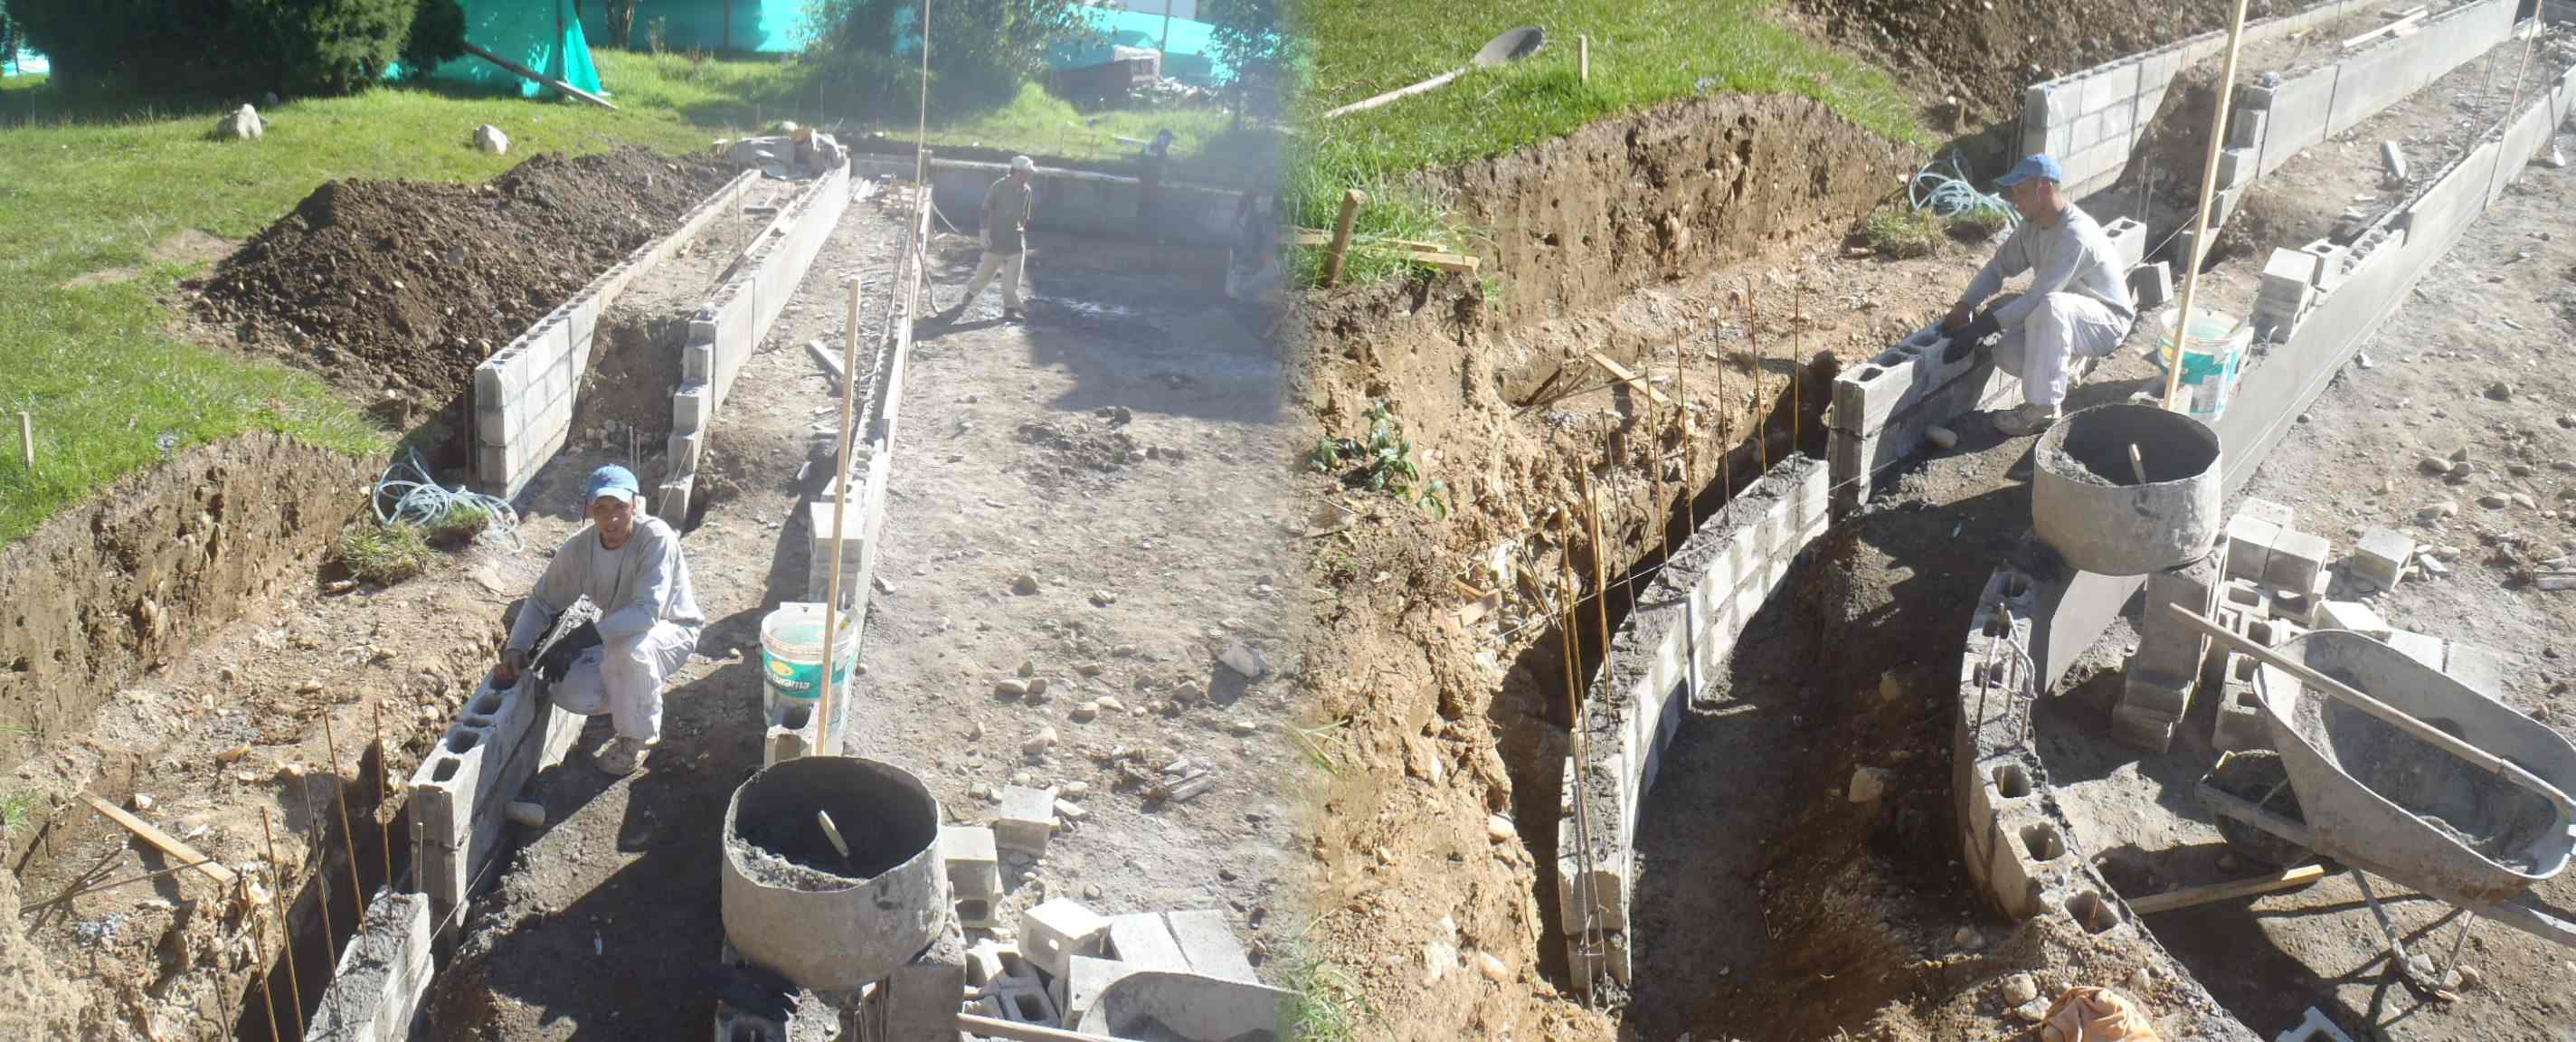 Mantenimiento de infraestructura